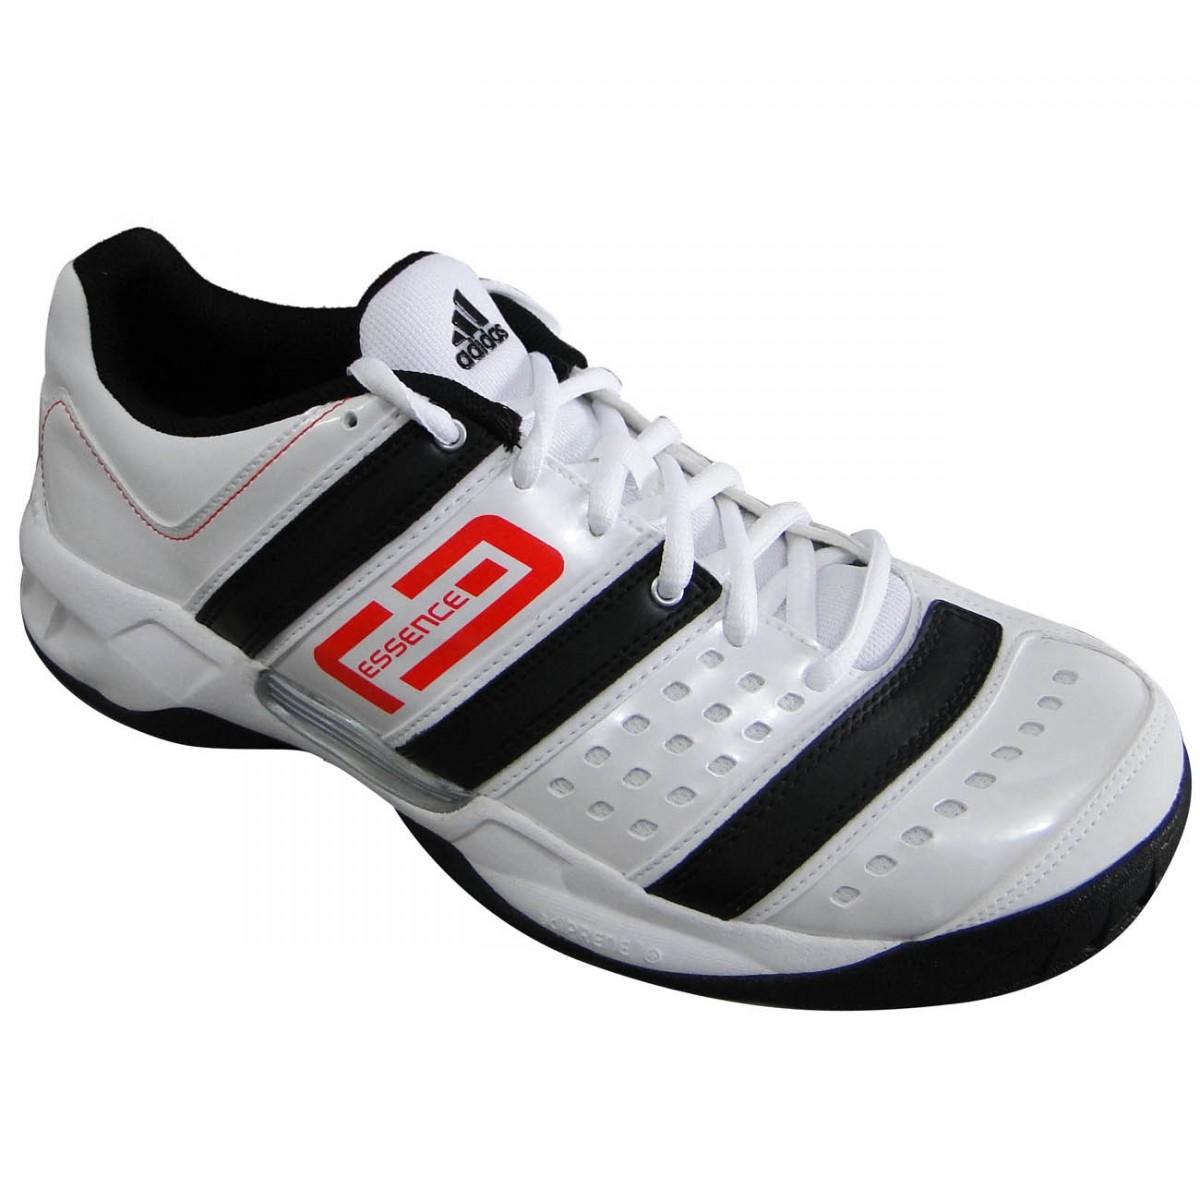 6c0672fc3b4 Tênis Adidas Stabil Essence 5597 - BRANCO PRETO VERMELHO - Chuteira Nike